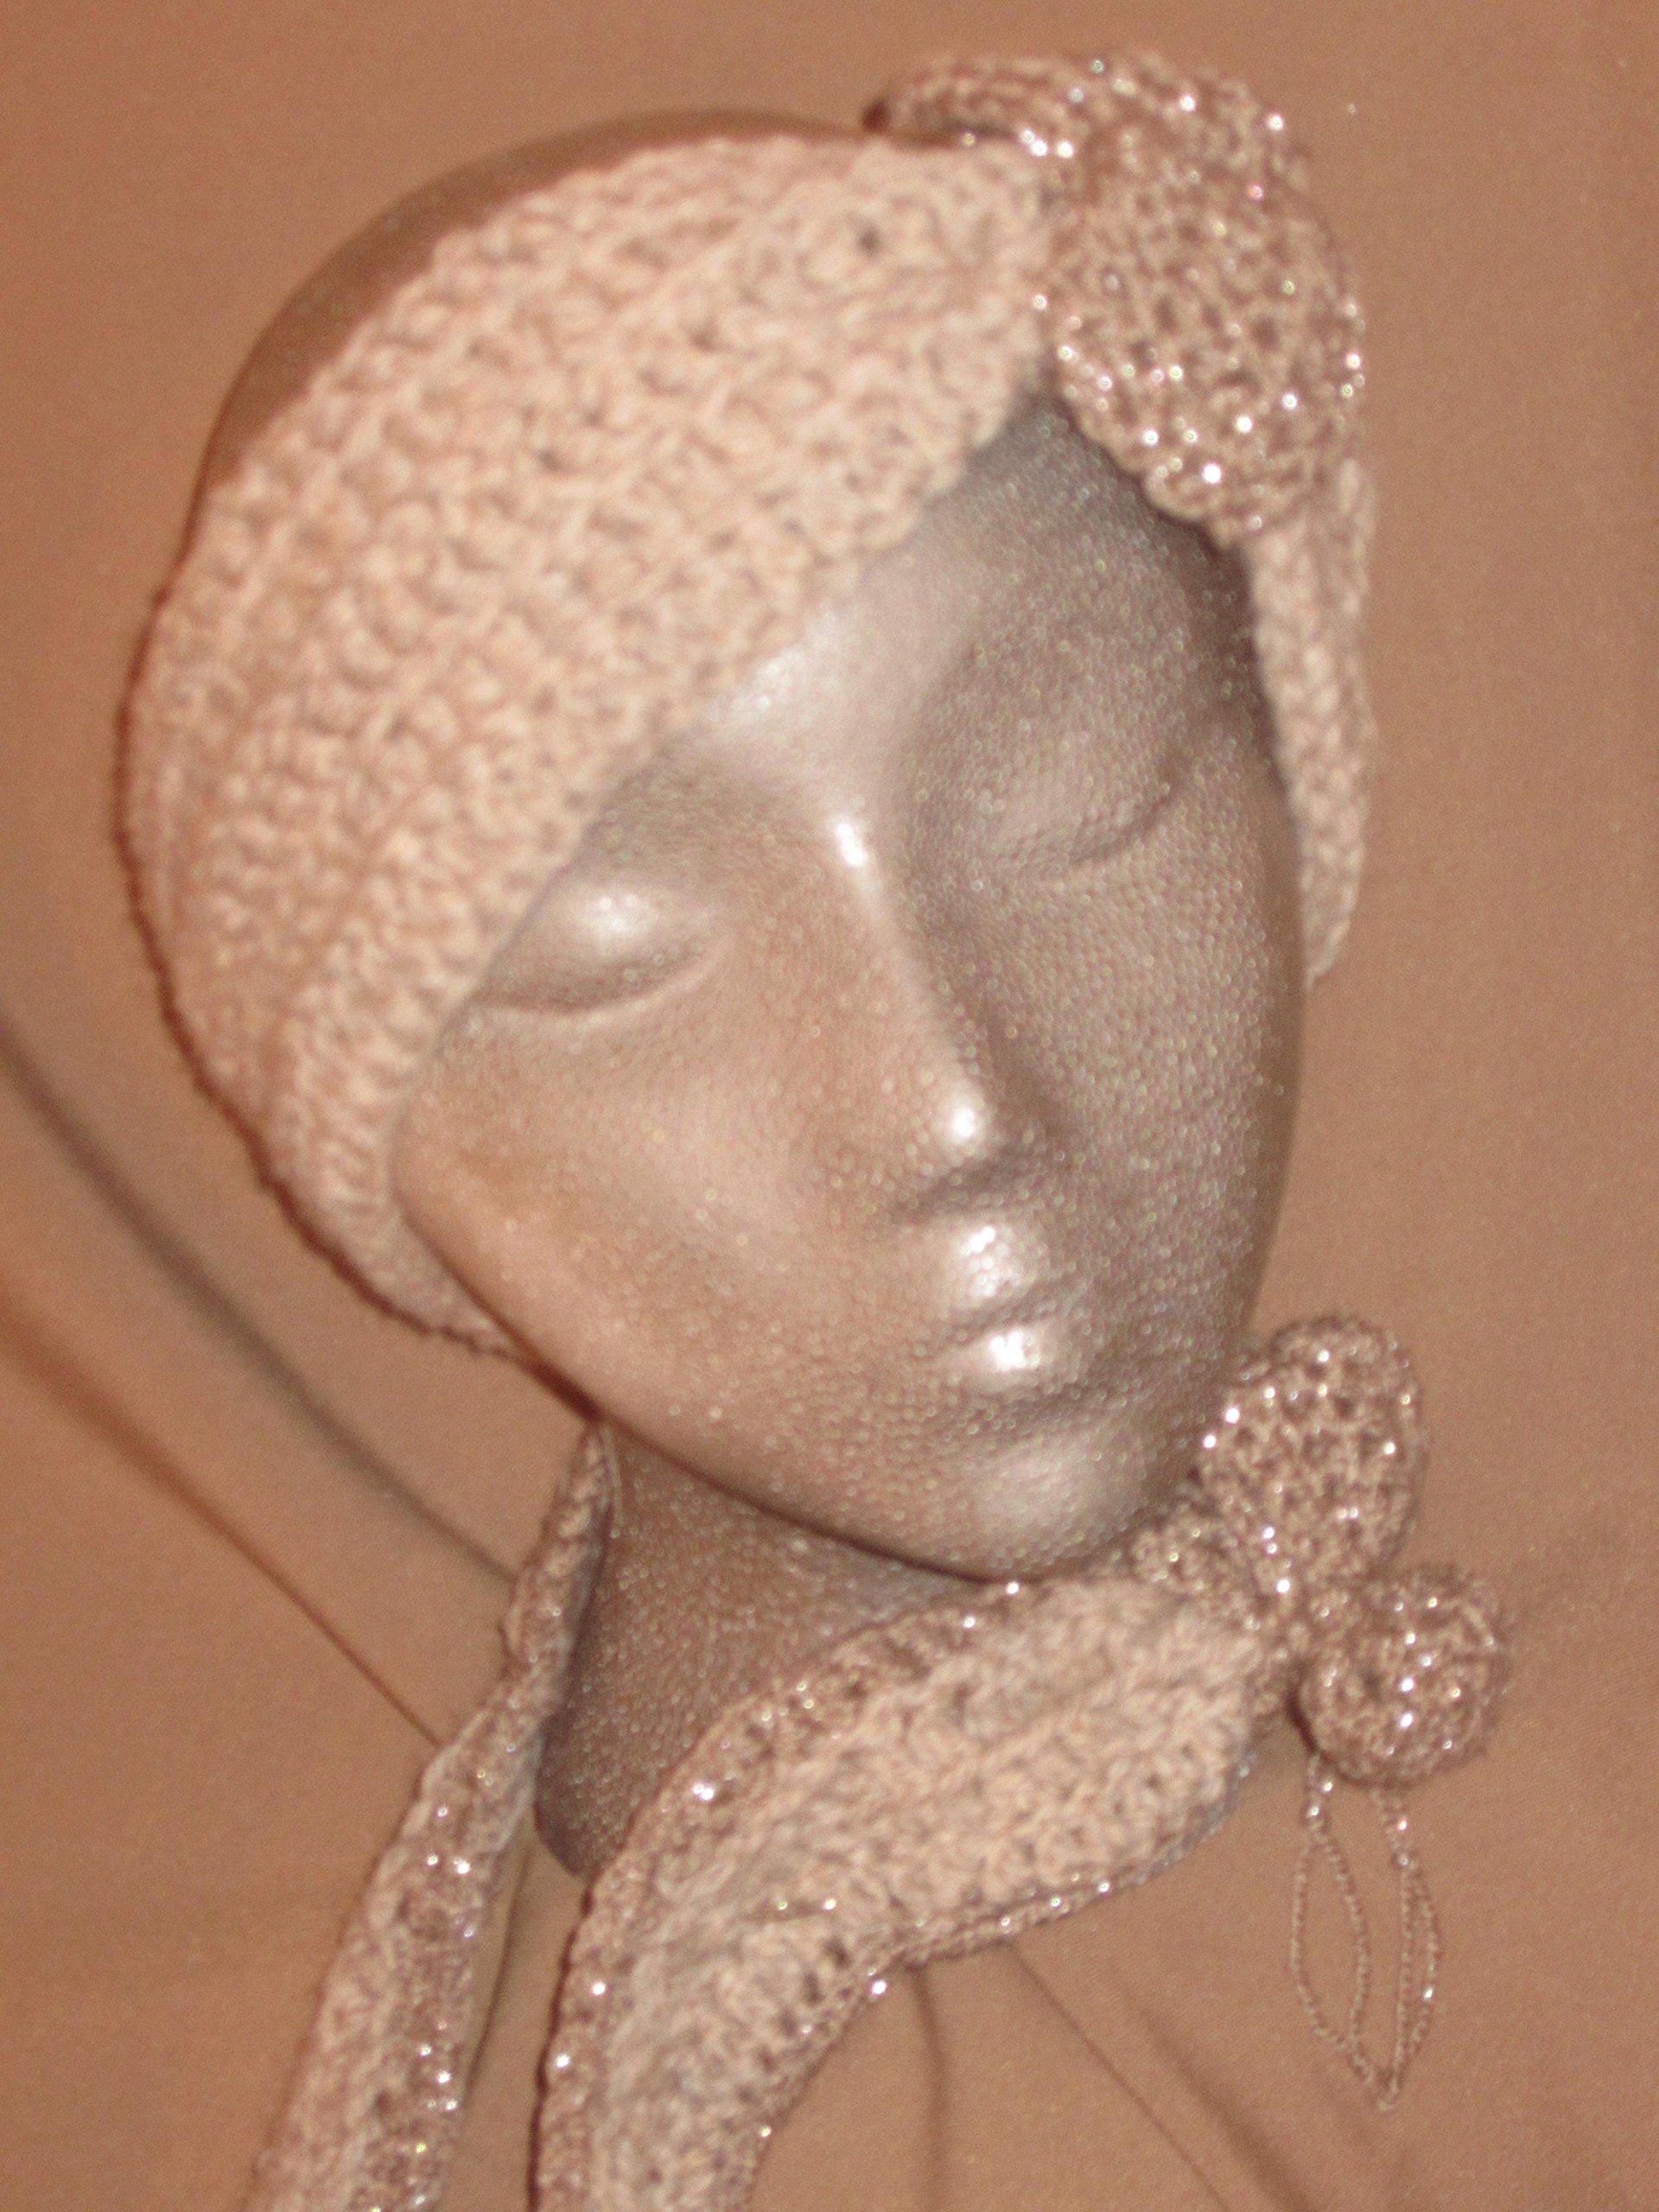 Diadem Headband and Scarf (one-of-a-kind) Original Design by D'Arcy Originale